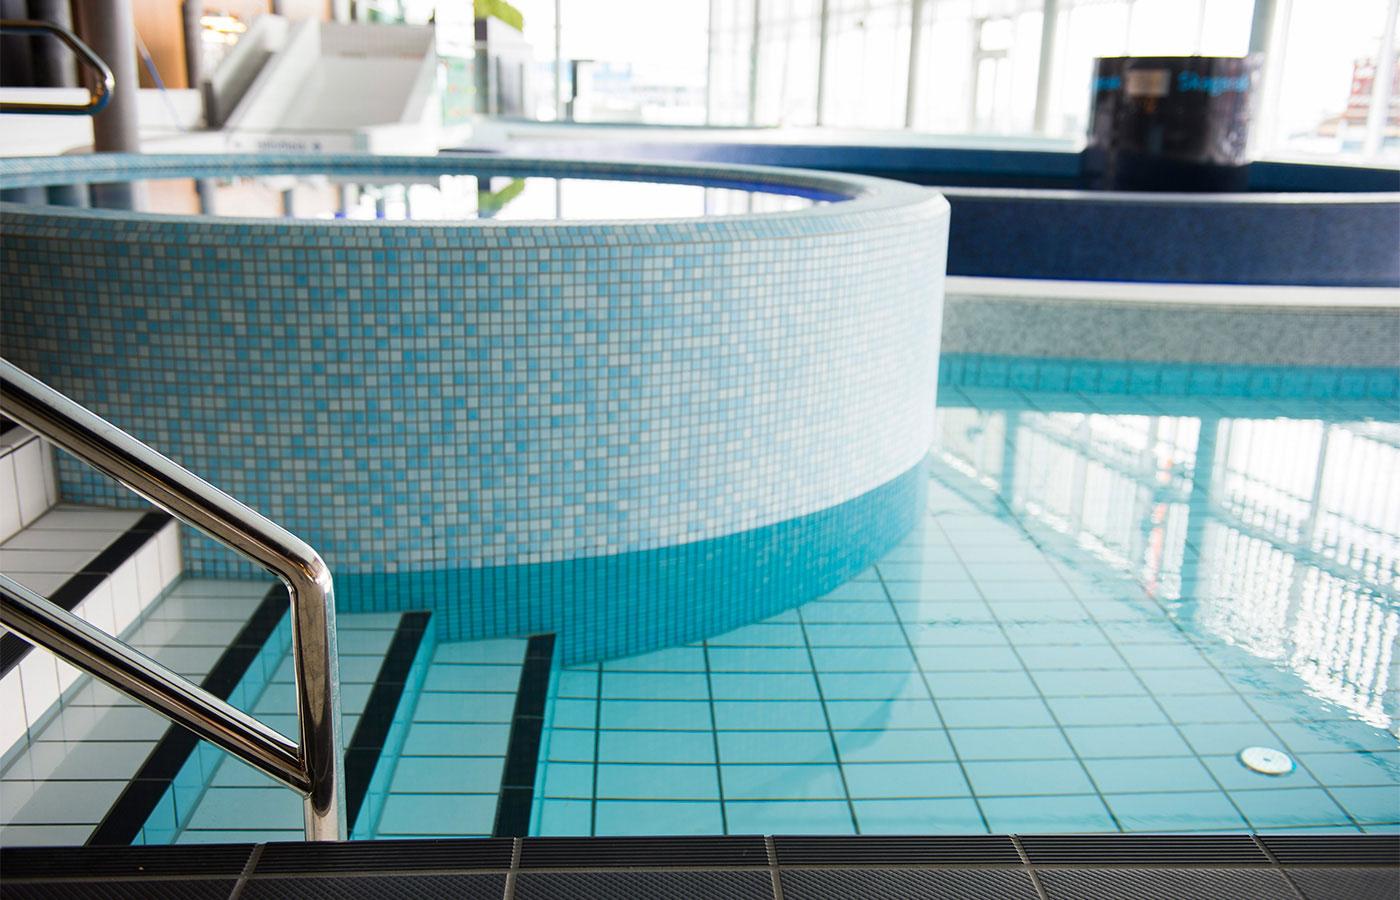 referenzen schwimmbad wellness spa jasba fliesen mosaike. Black Bedroom Furniture Sets. Home Design Ideas